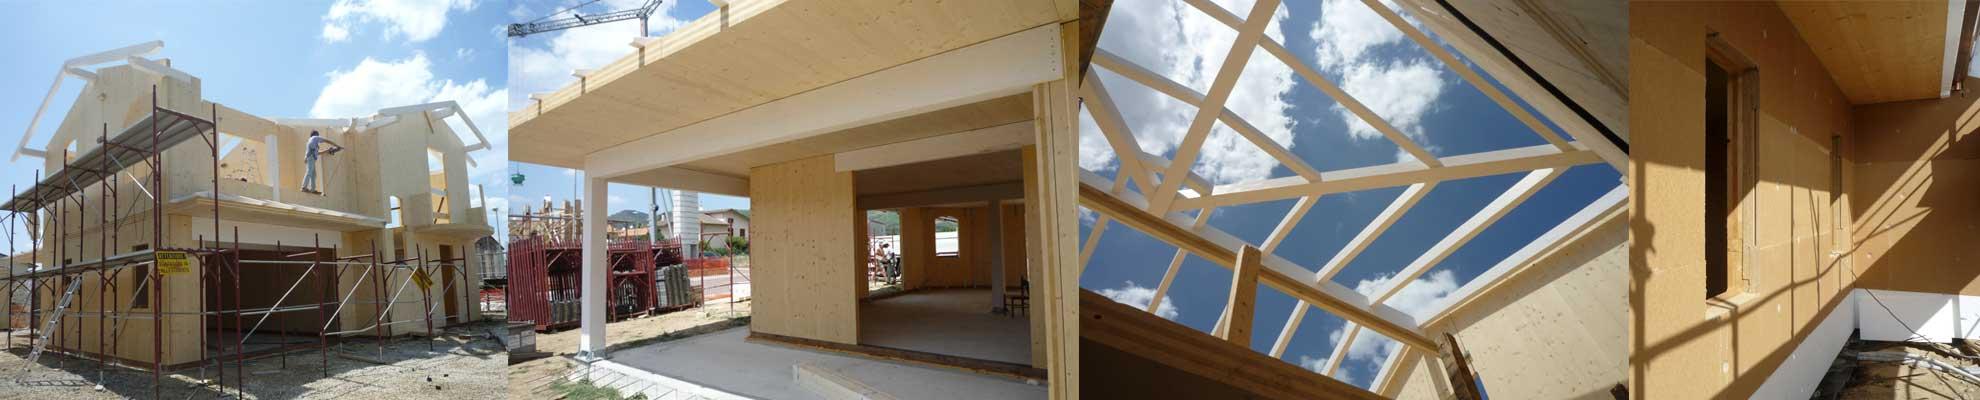 Casa a due piani umbertide umbria costantini sistema for Piani di casa autosufficienti